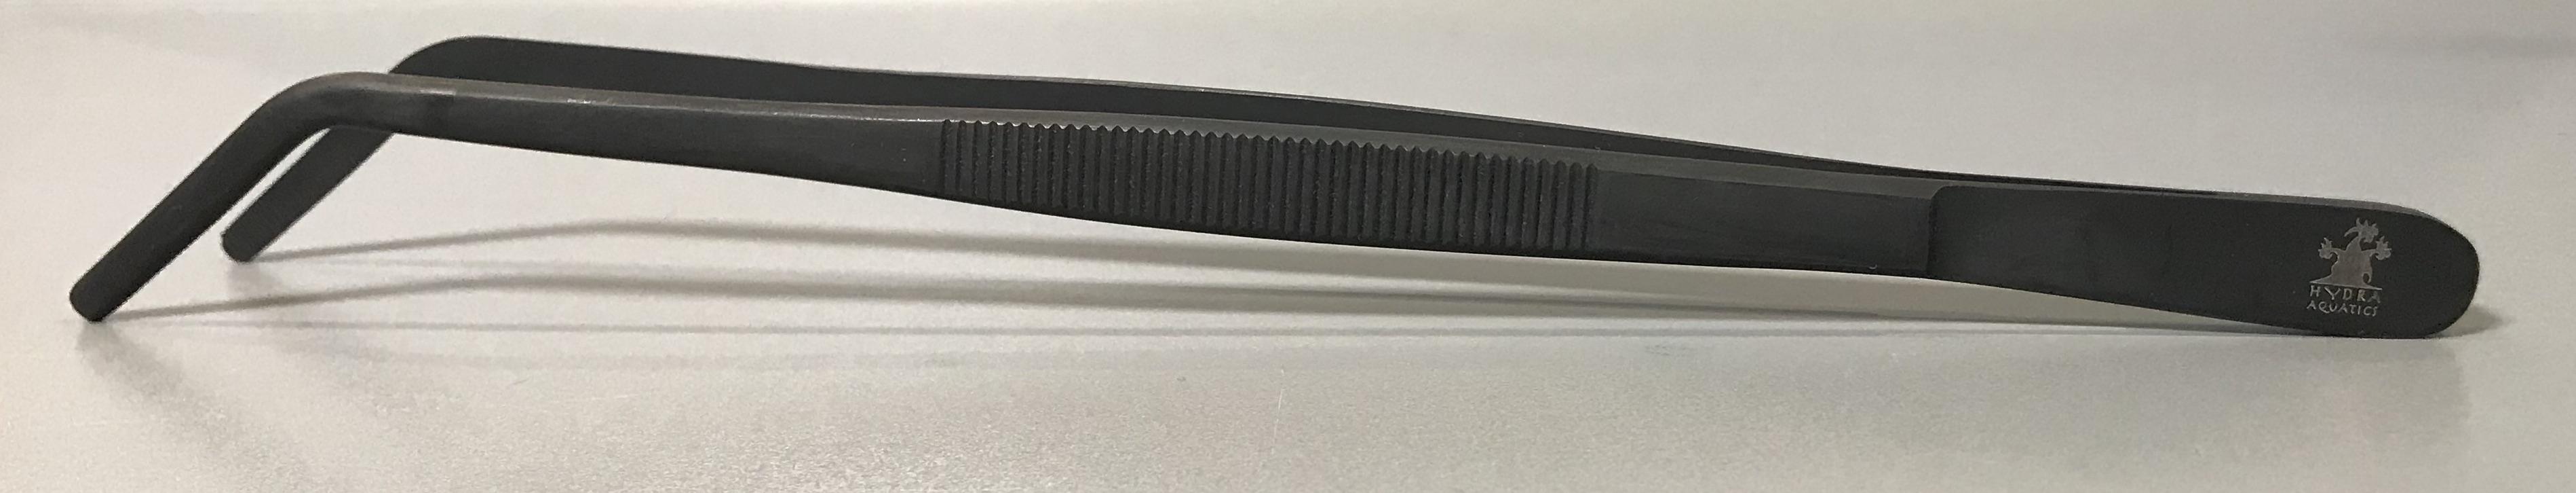 Grip Pinsette Tweezers Curved - Black Oxide - 10